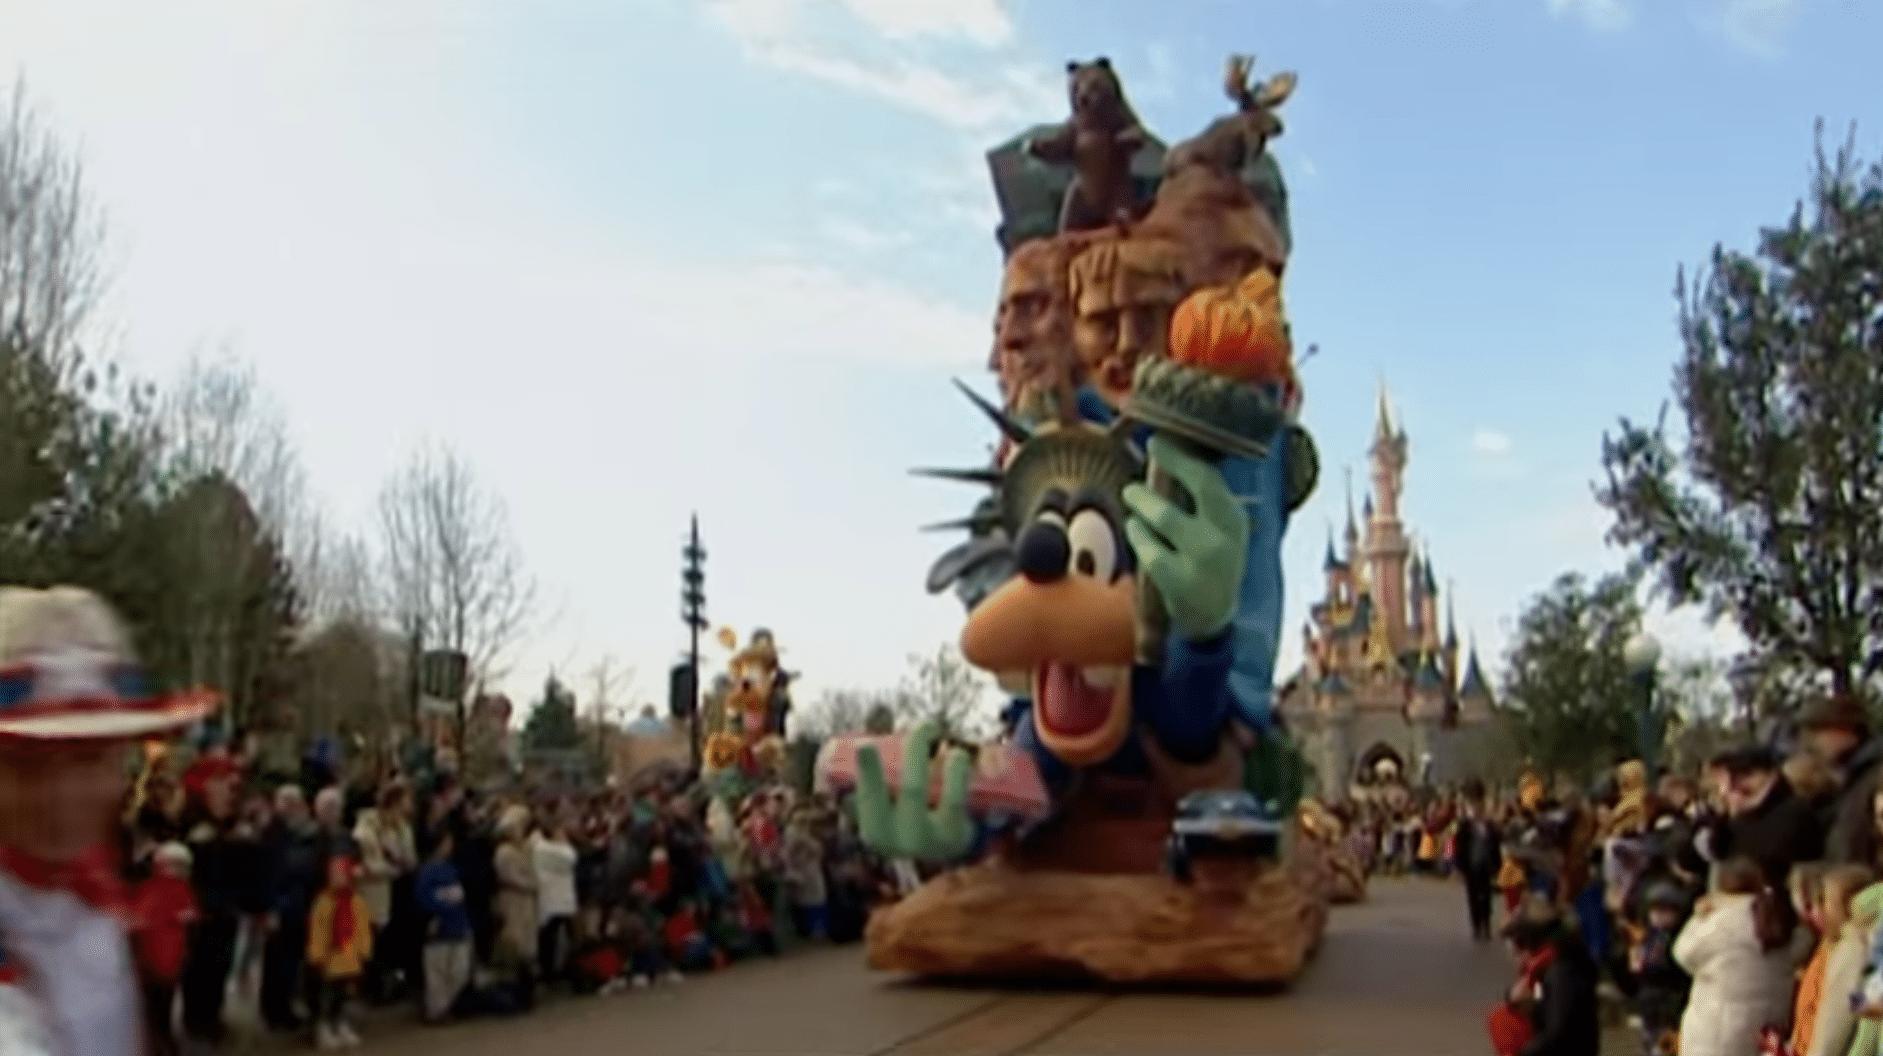 25 Years of Parades at Disneyland Paris - Travel to the Magic